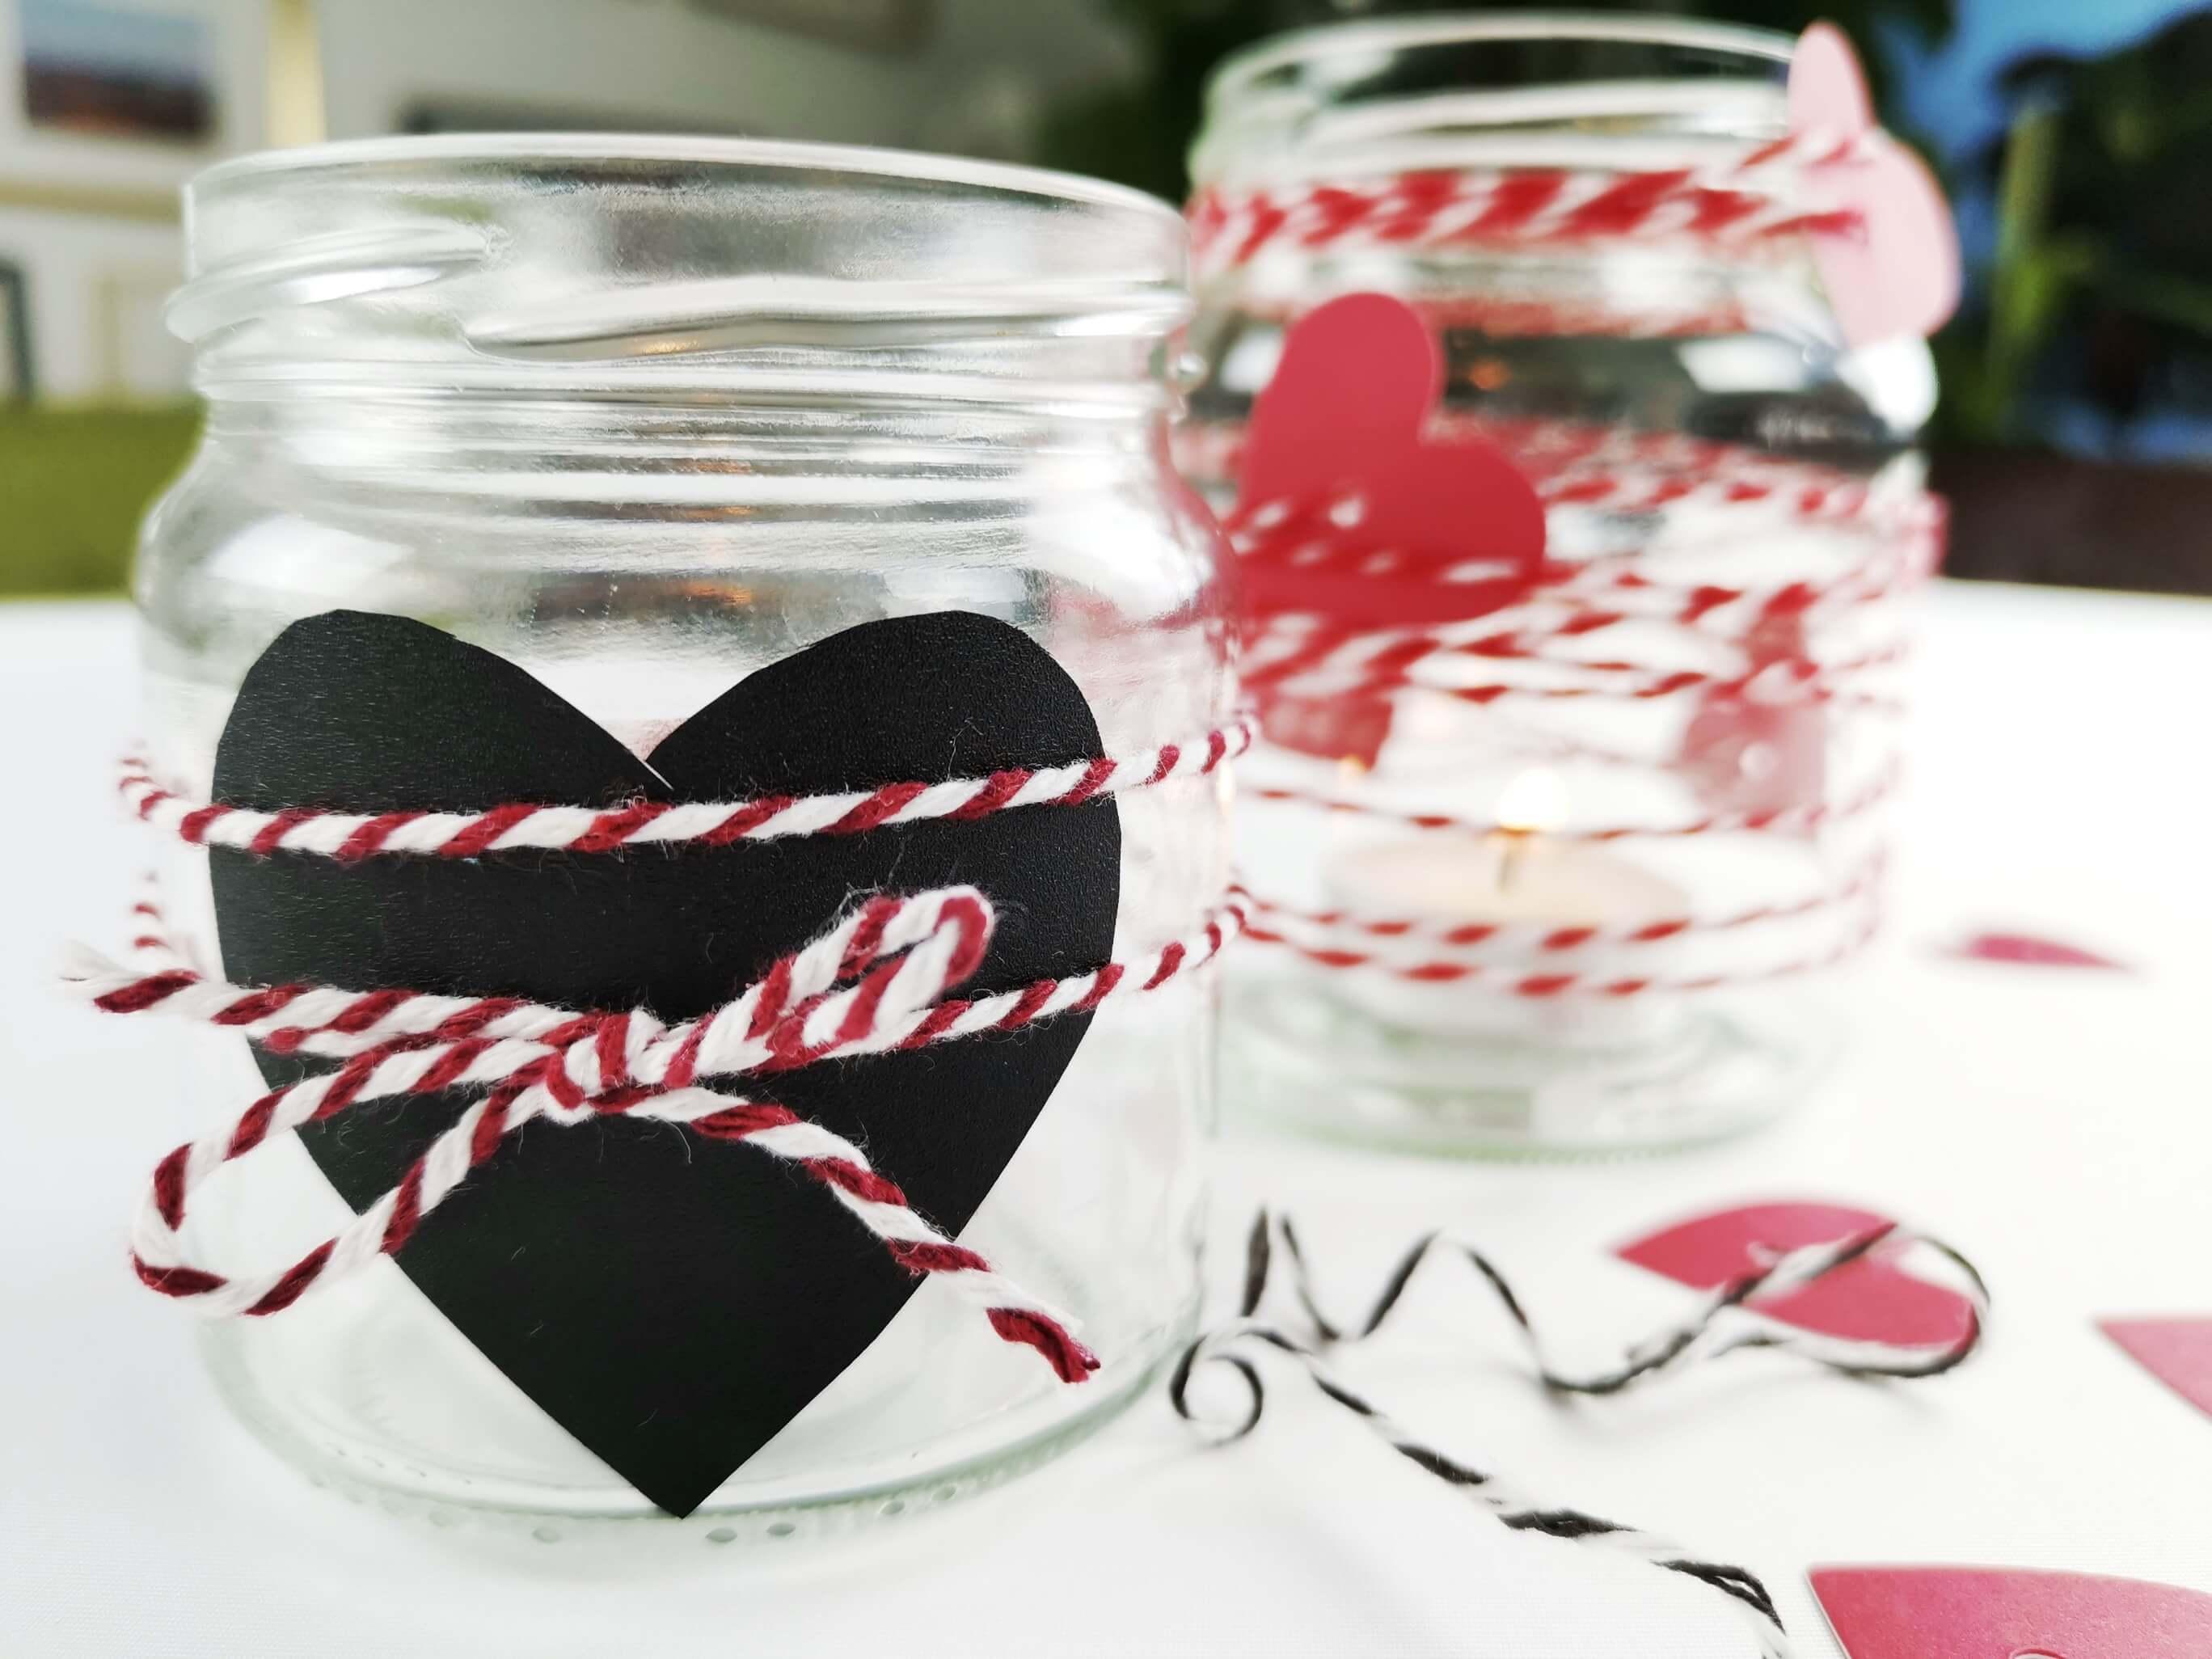 IMG 20190204 165342 01 resized 20190204 074509911 - Nur keine Panik! Last minute Valentinstagsgeschenke